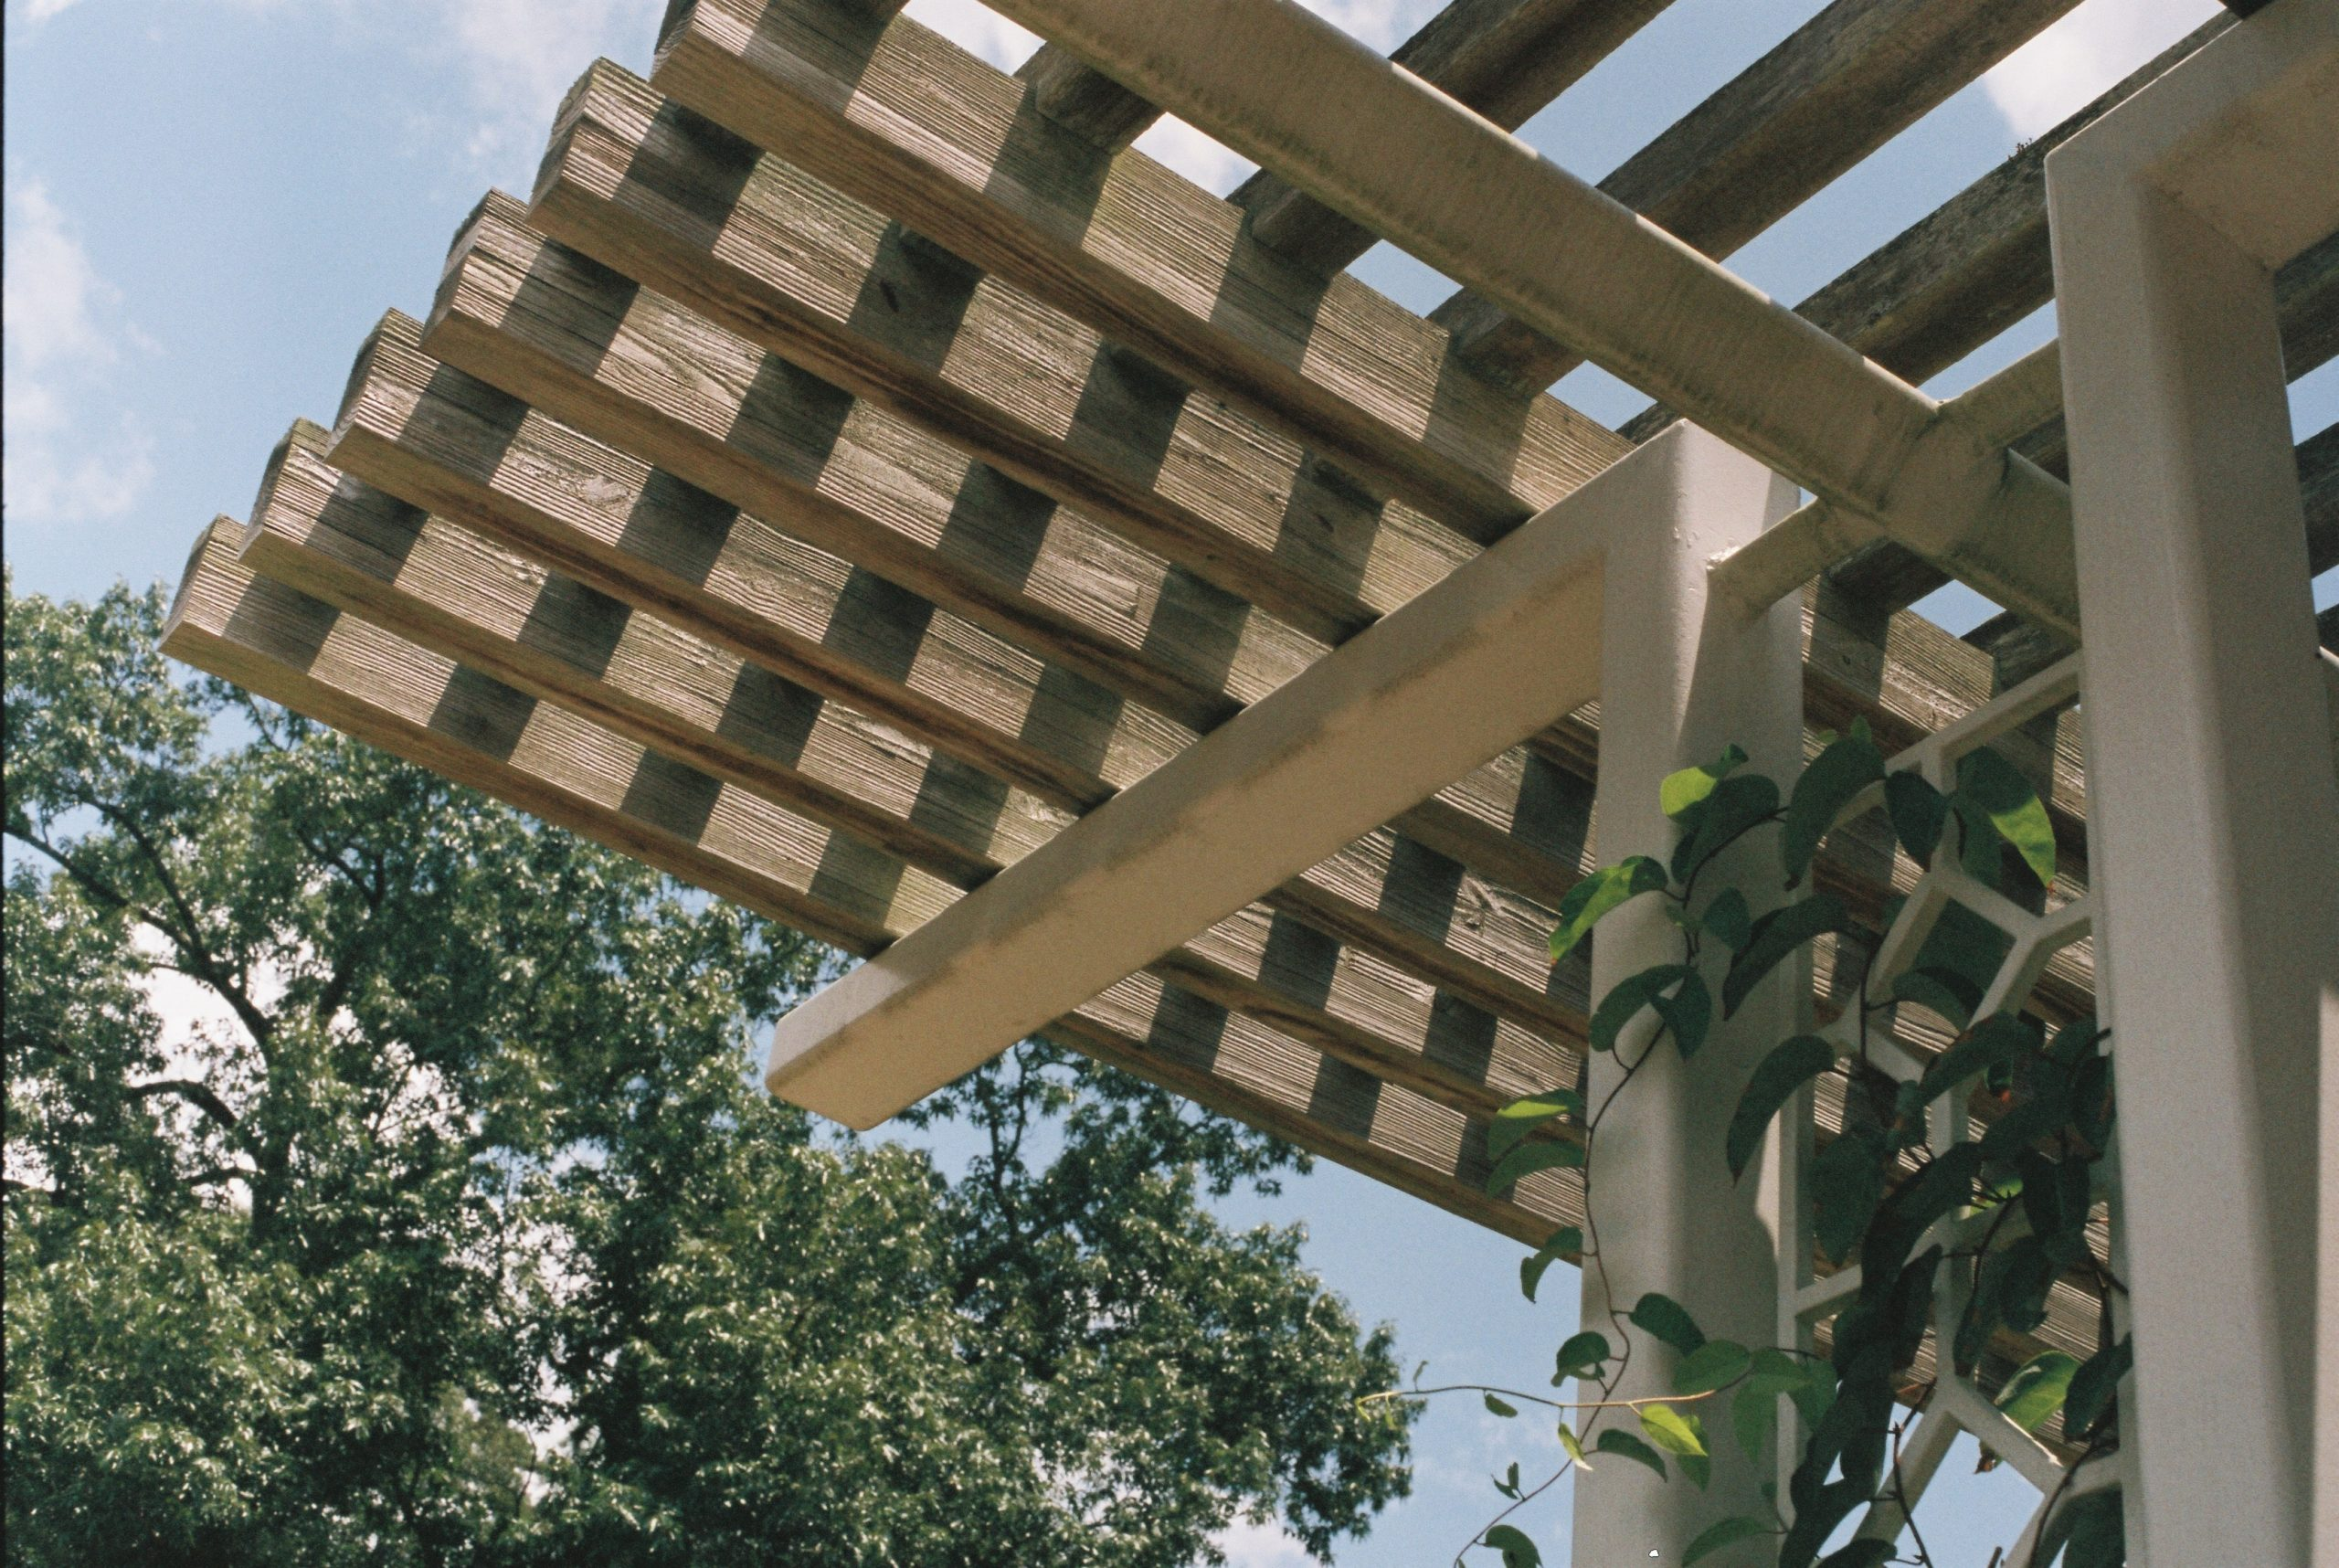 Outdoor Living Spaces: Choosing a Patio or Pergola Roof Design